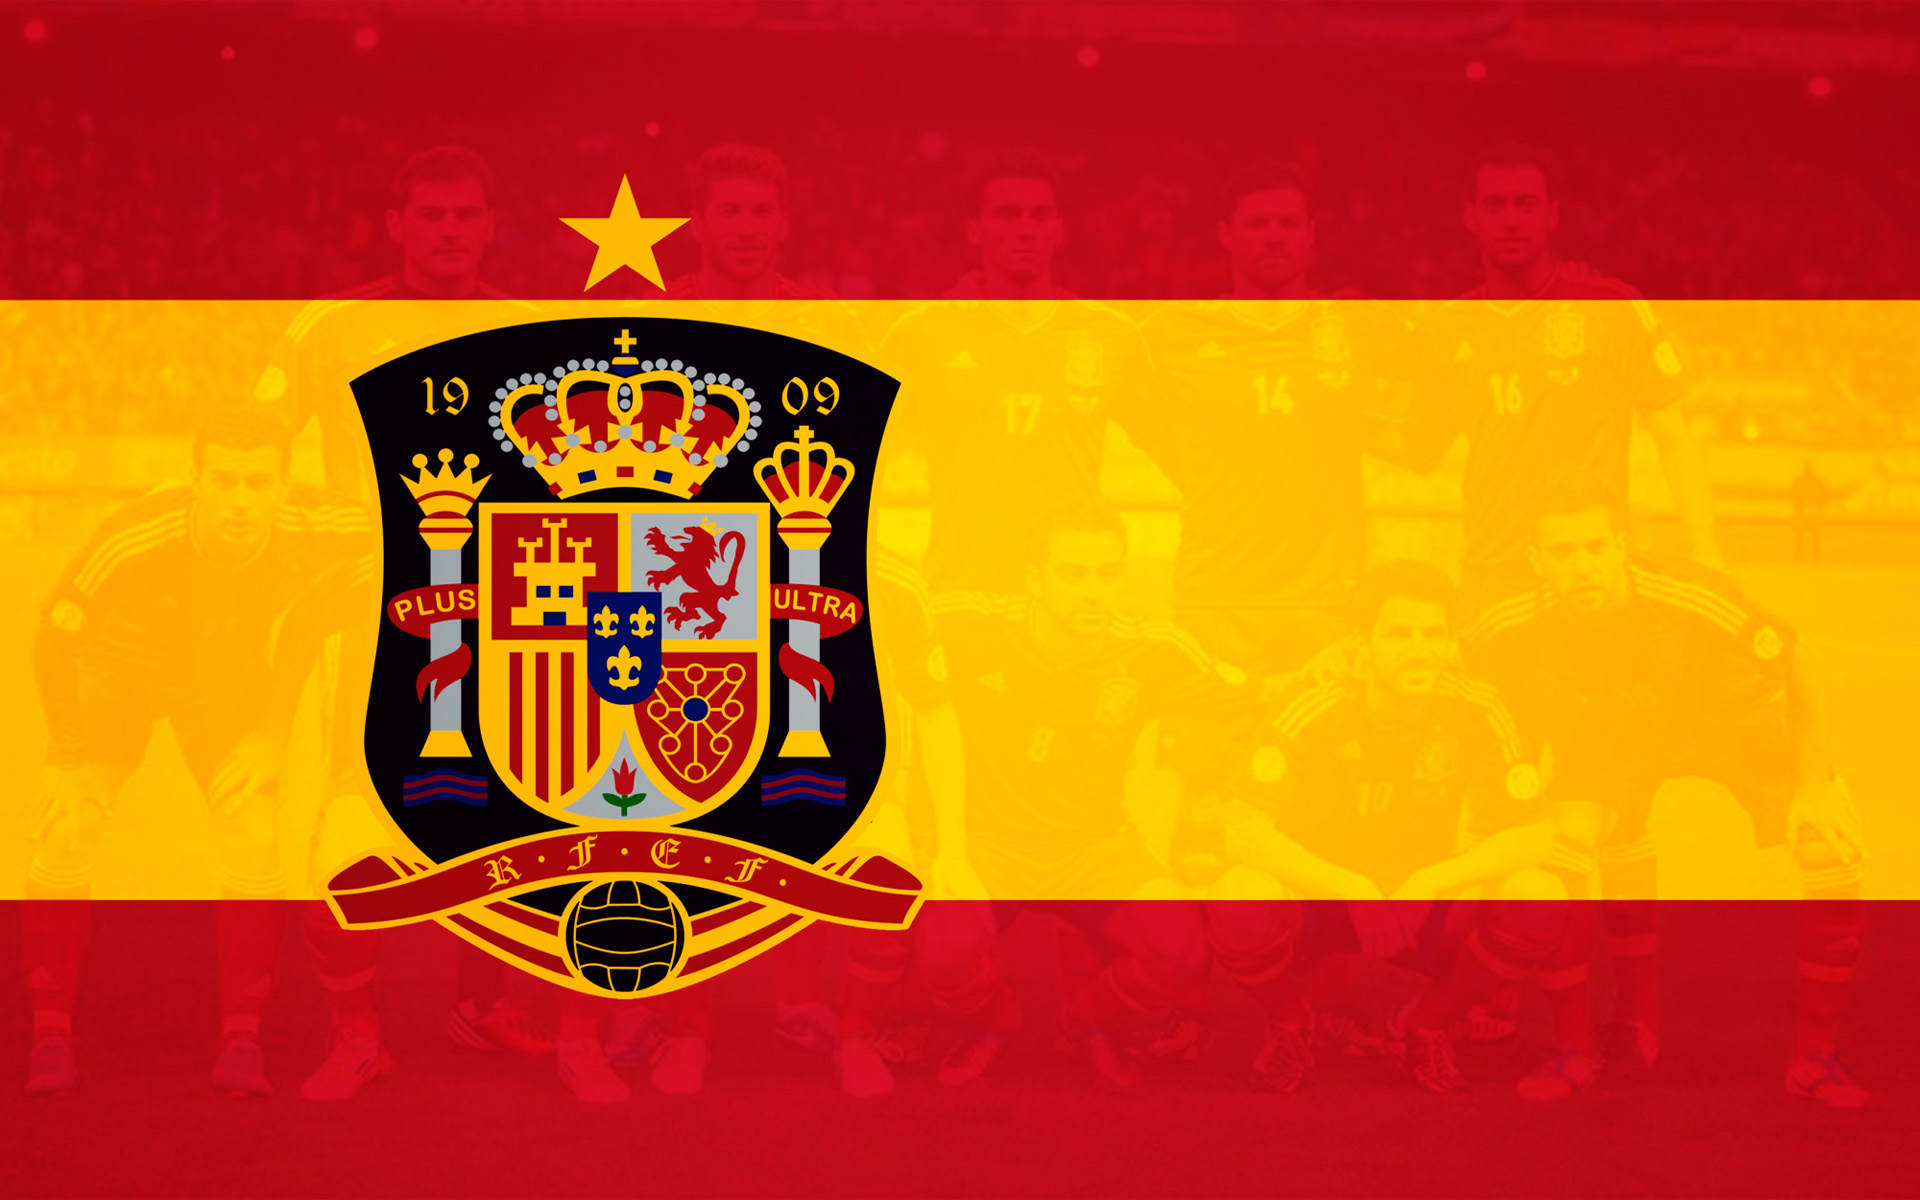 Spain Soccer Team Wallpapers  Wallpaper Cave